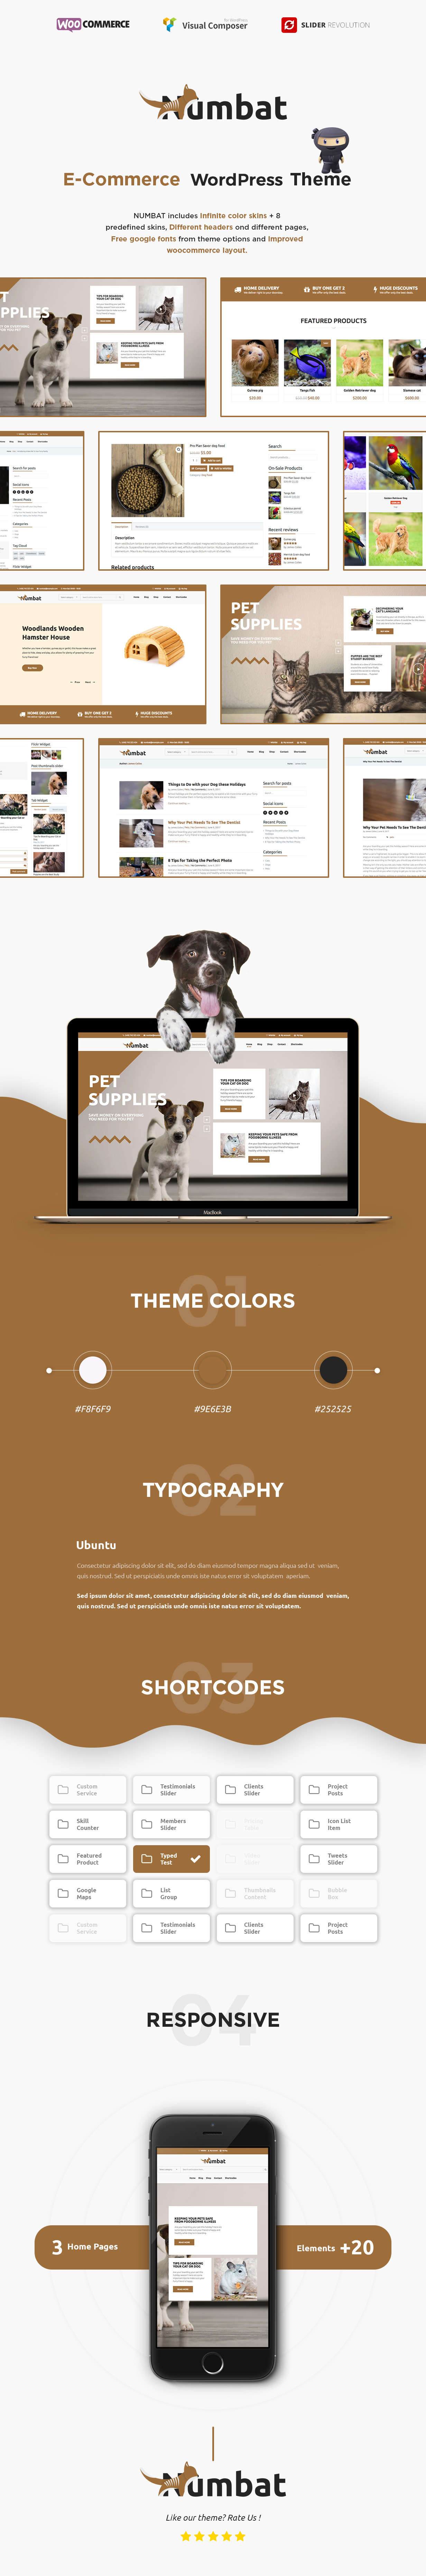 Numbat - Tierhandlung WooCommerce WordPress Theme - 2